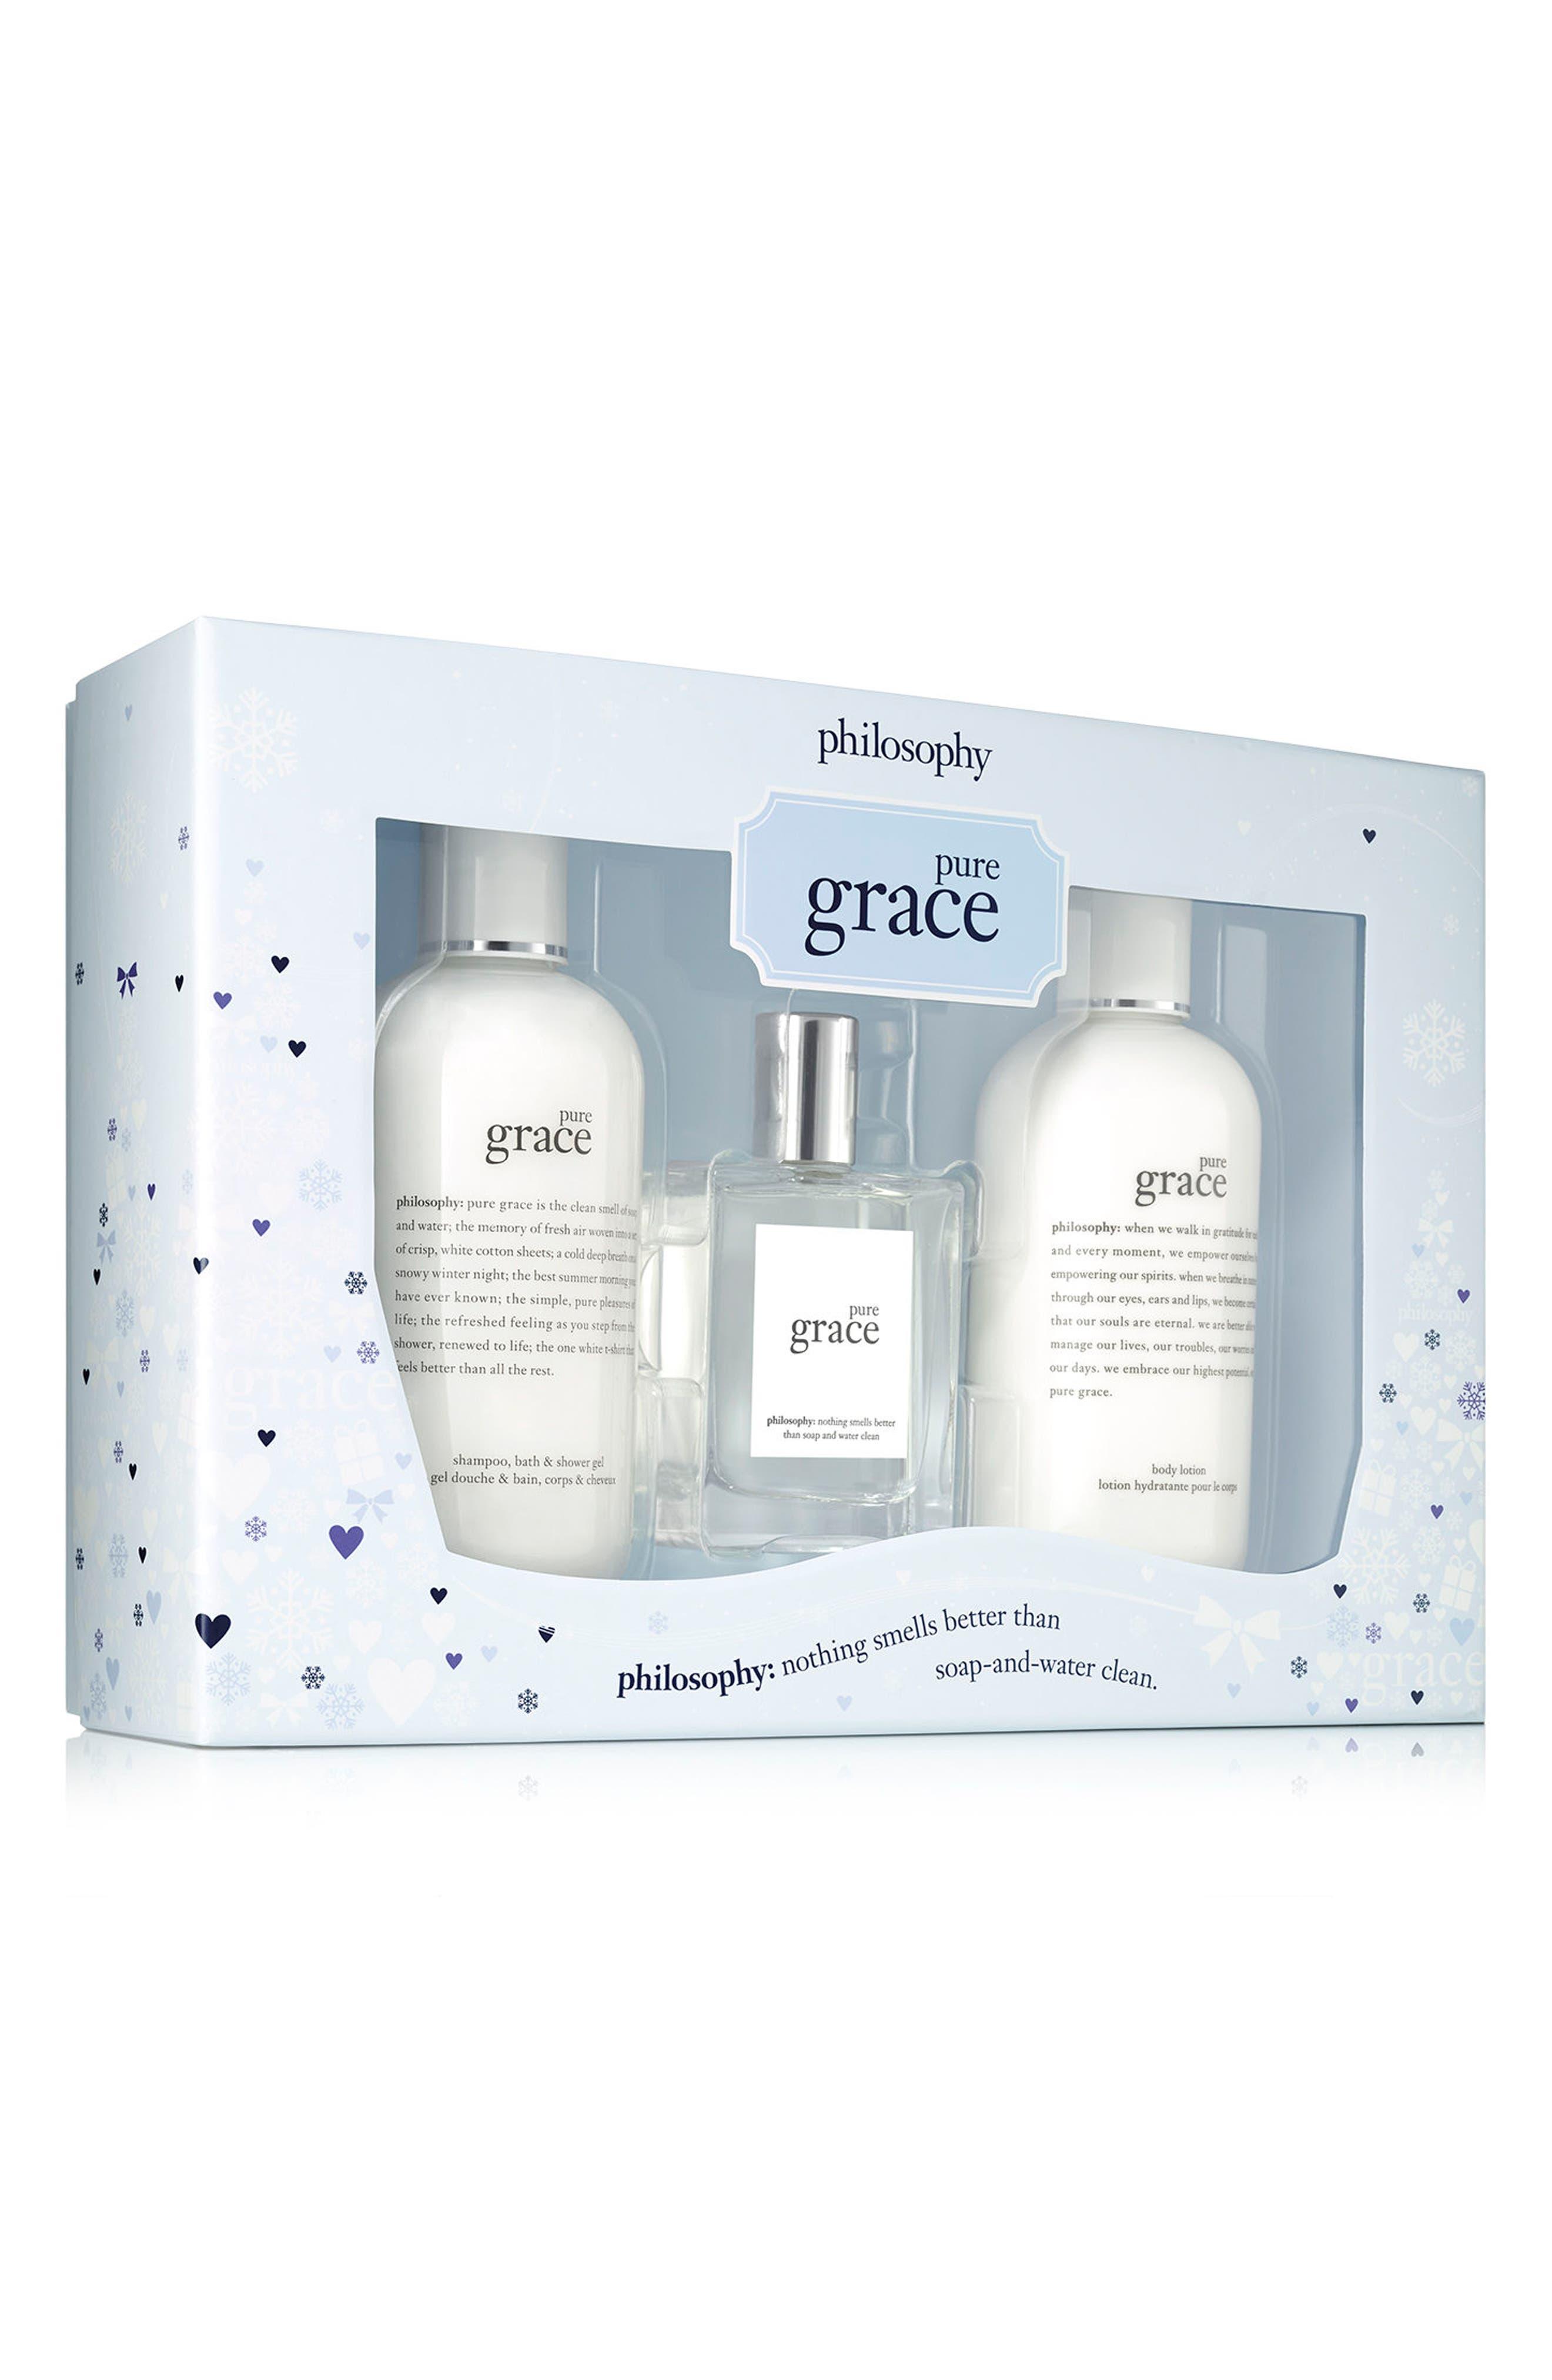 philosophy pure grace set (Limited Edition) ($88 Value)